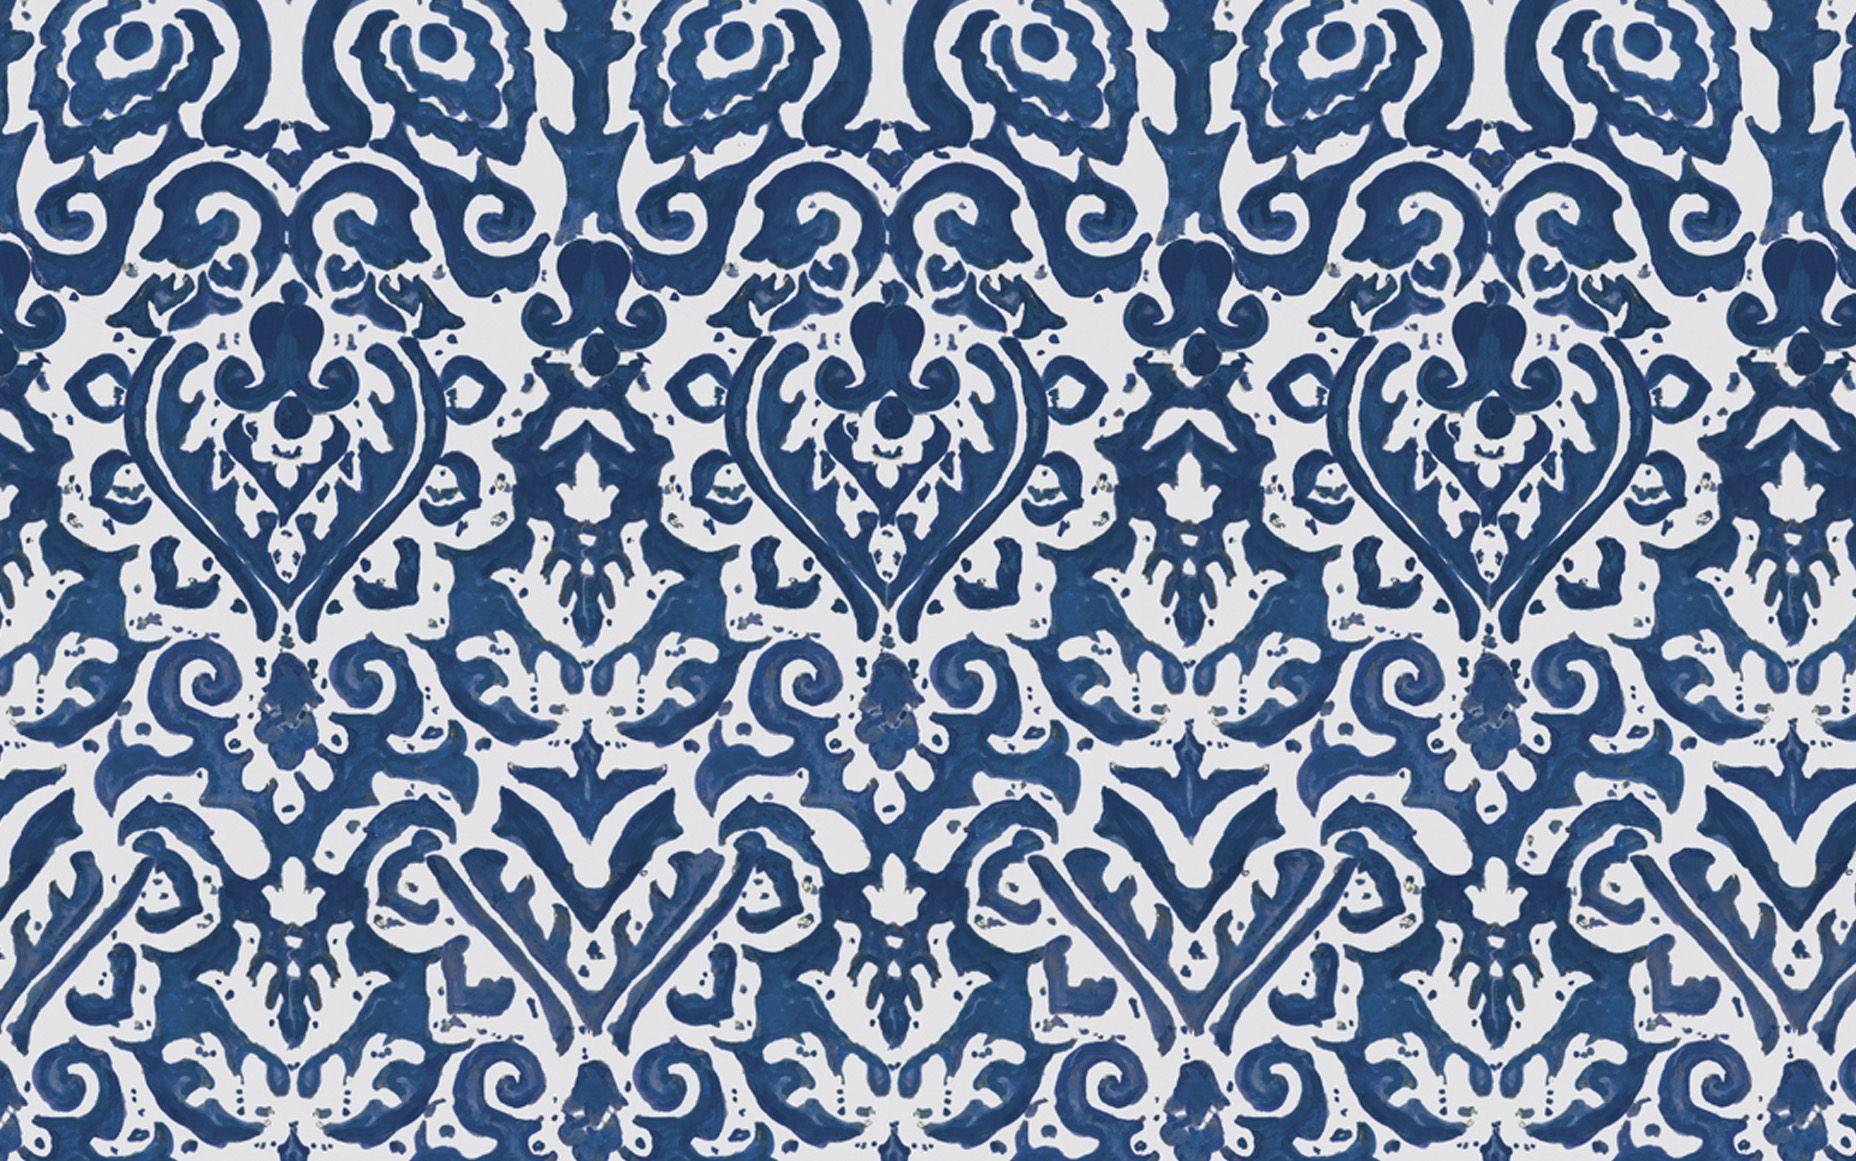 Prints & Patterns Rapsodiacom